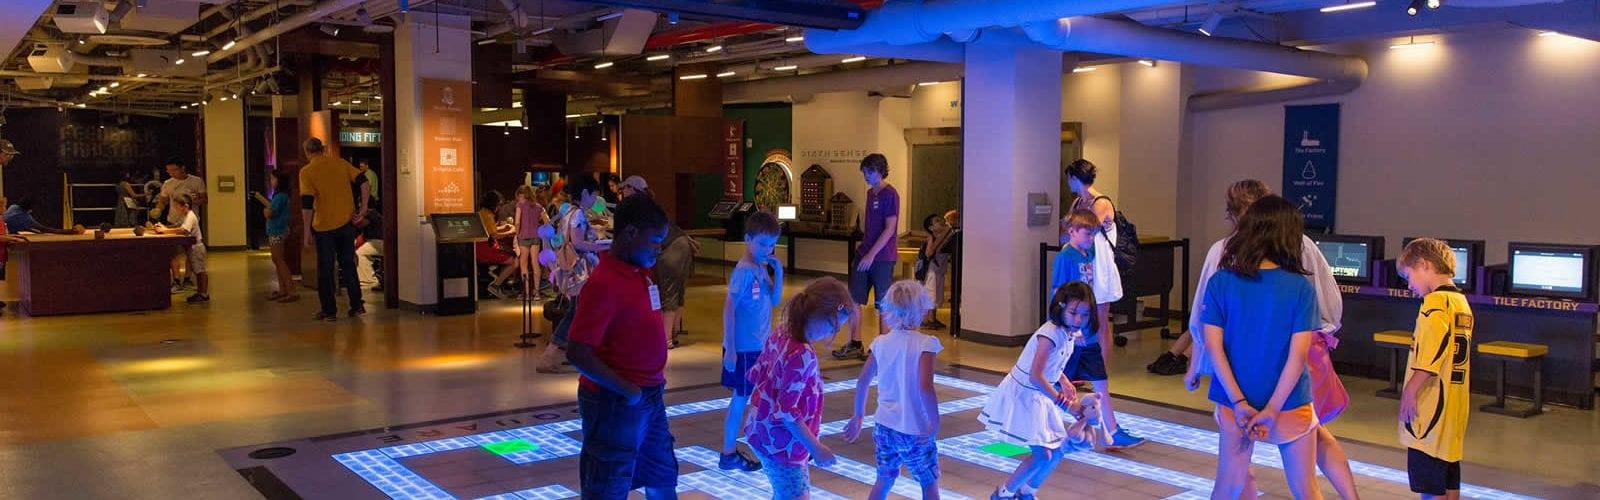 visiter-national-museum-mathematics-new-york-momath-une